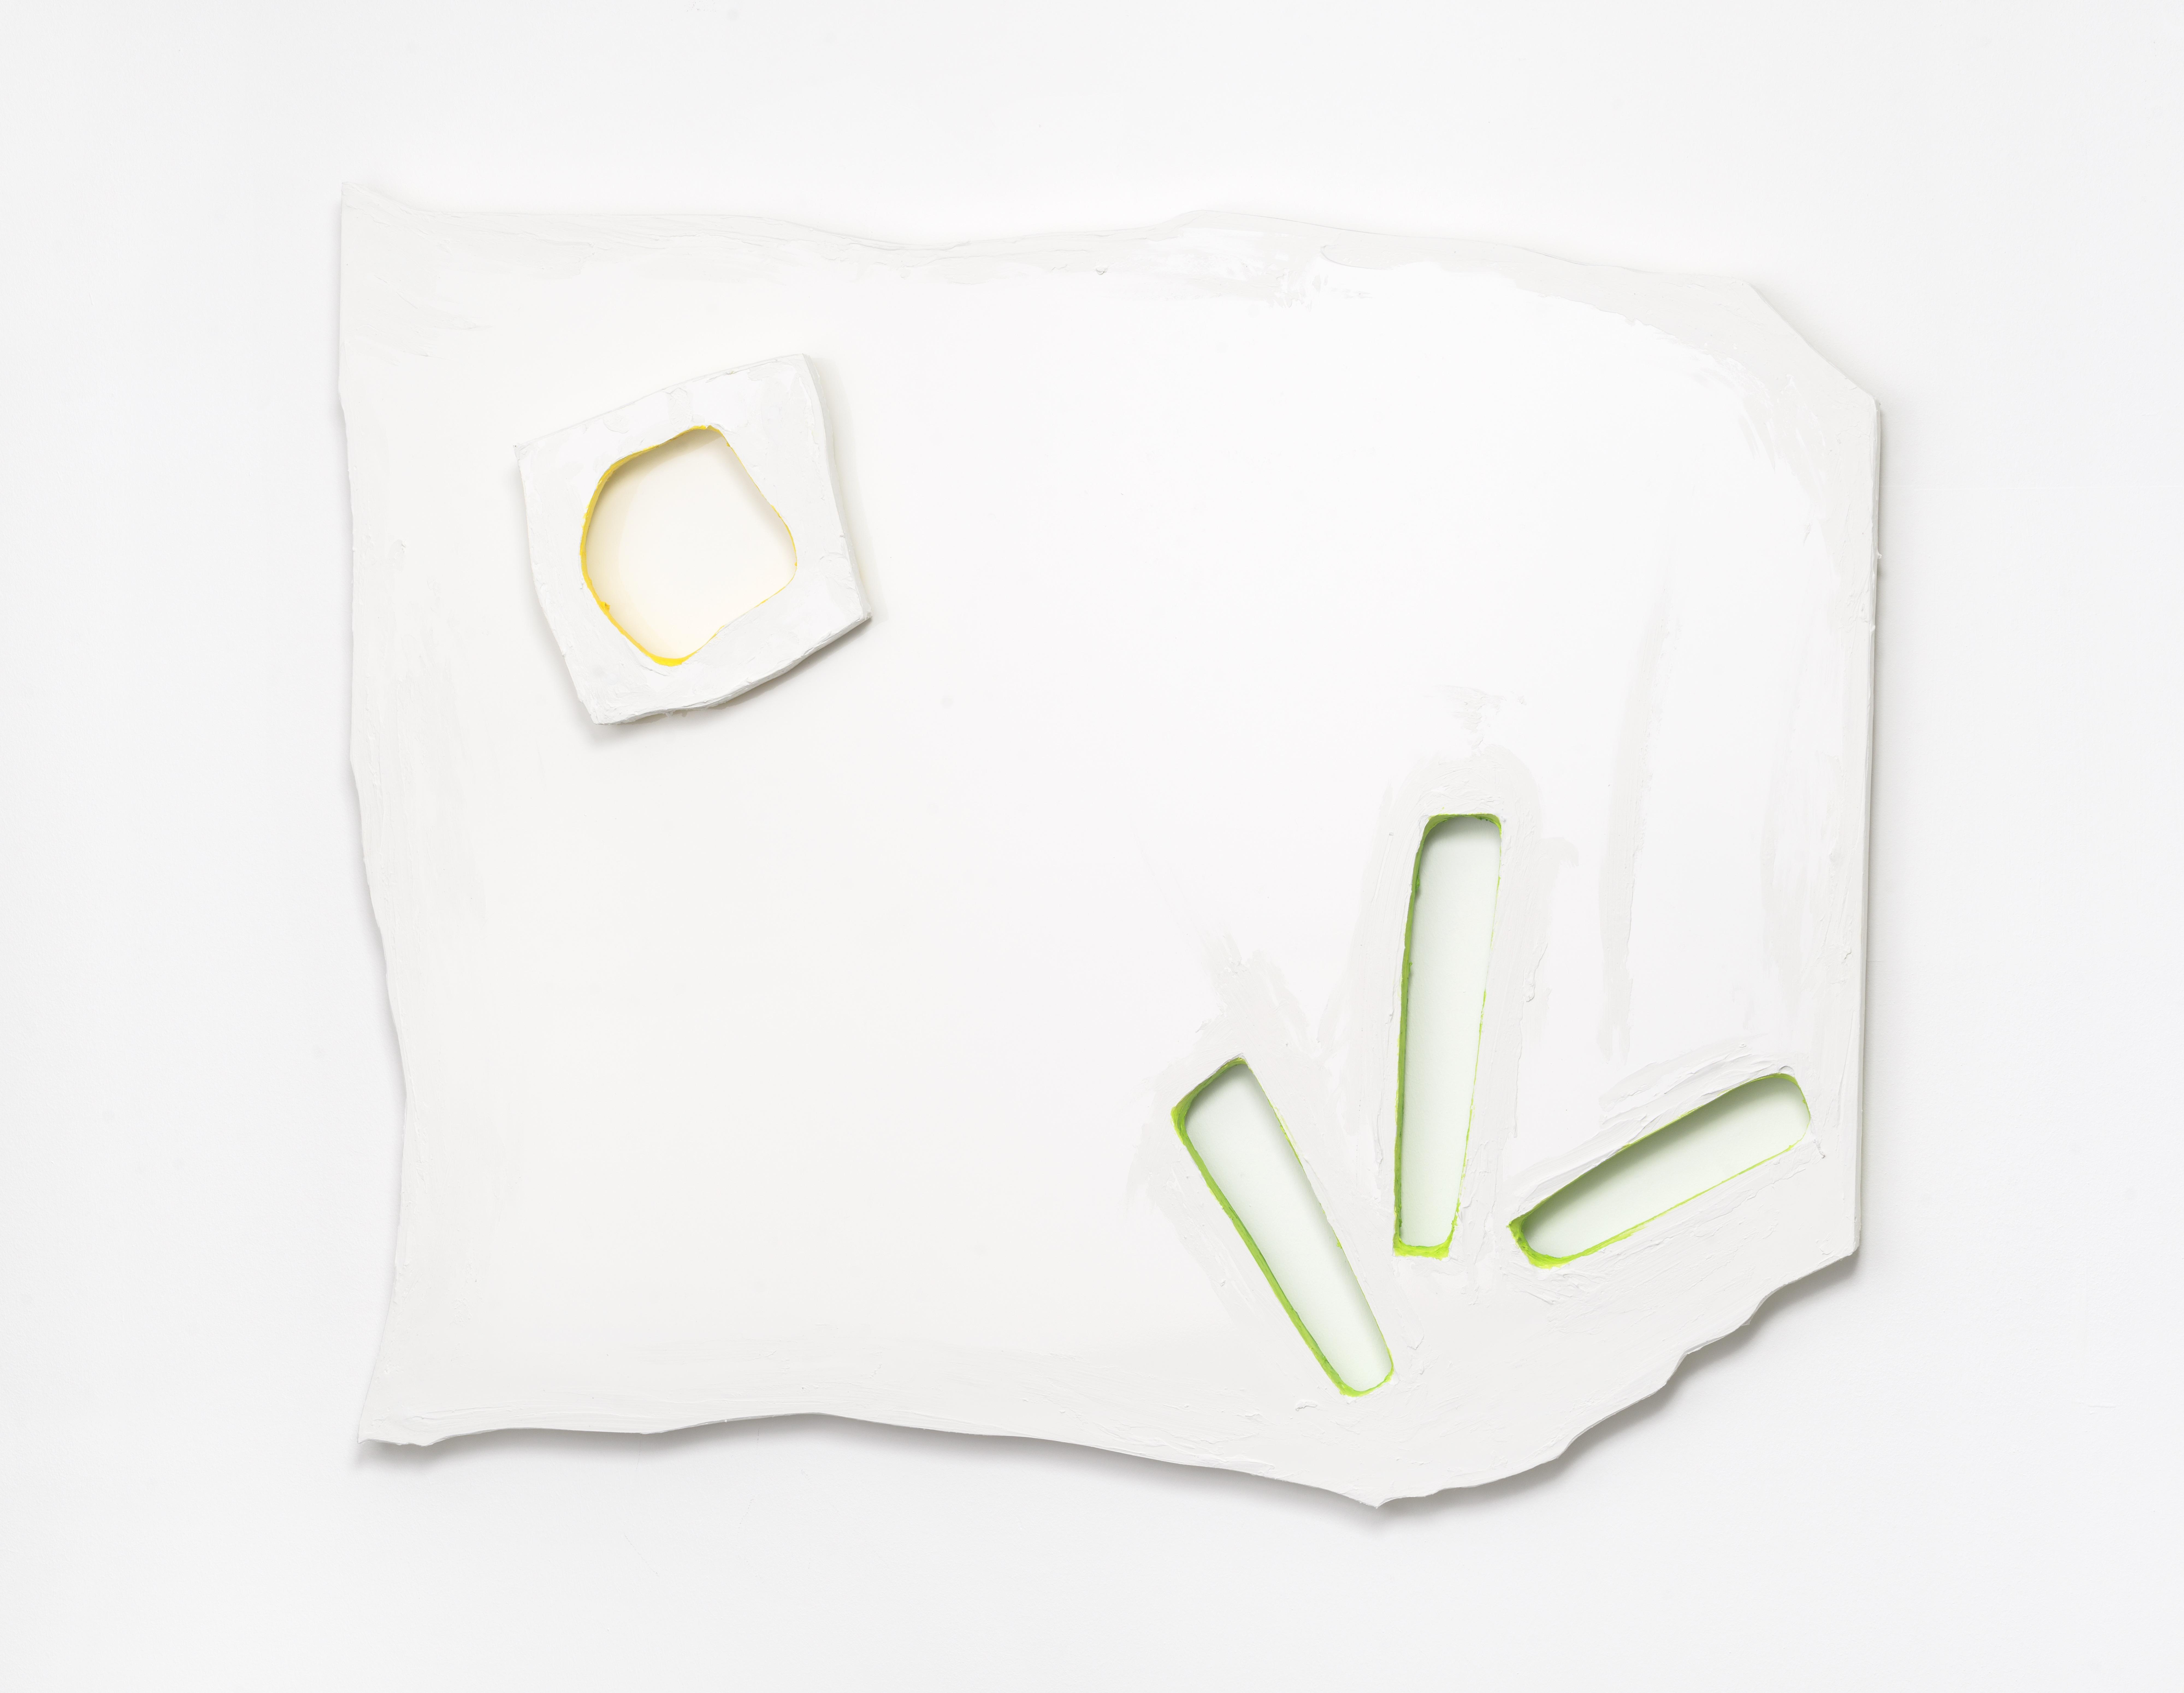 5. Adrian Altintas - AAD025 - 2021 - Untitled 118,8 x 95,5 x 6,5 cm. - Sandwichpanel, Acryl.